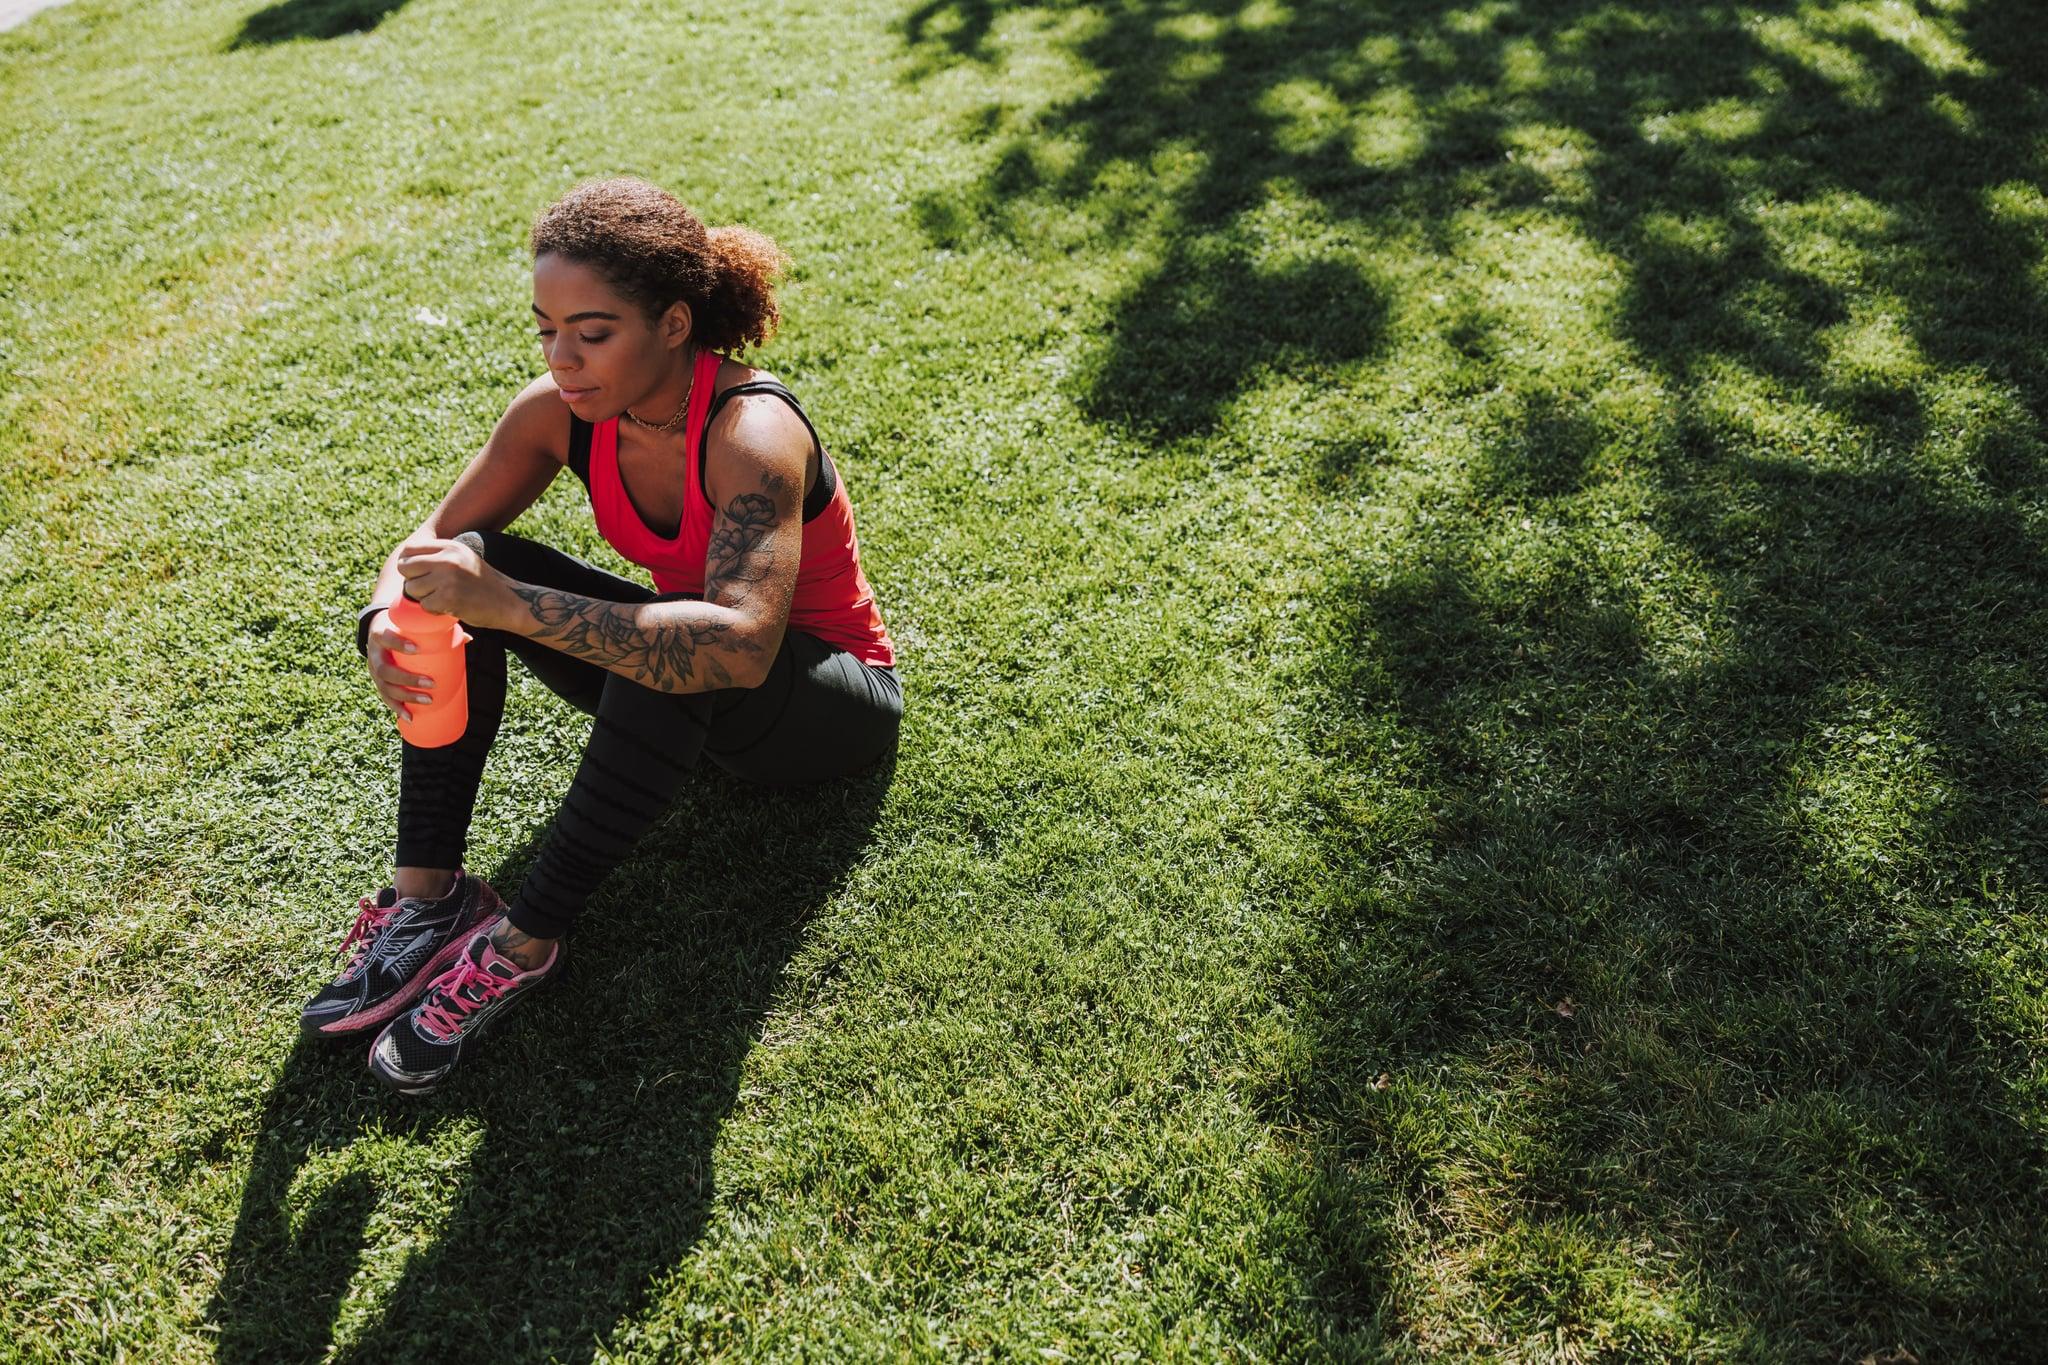 avoid overheating while running